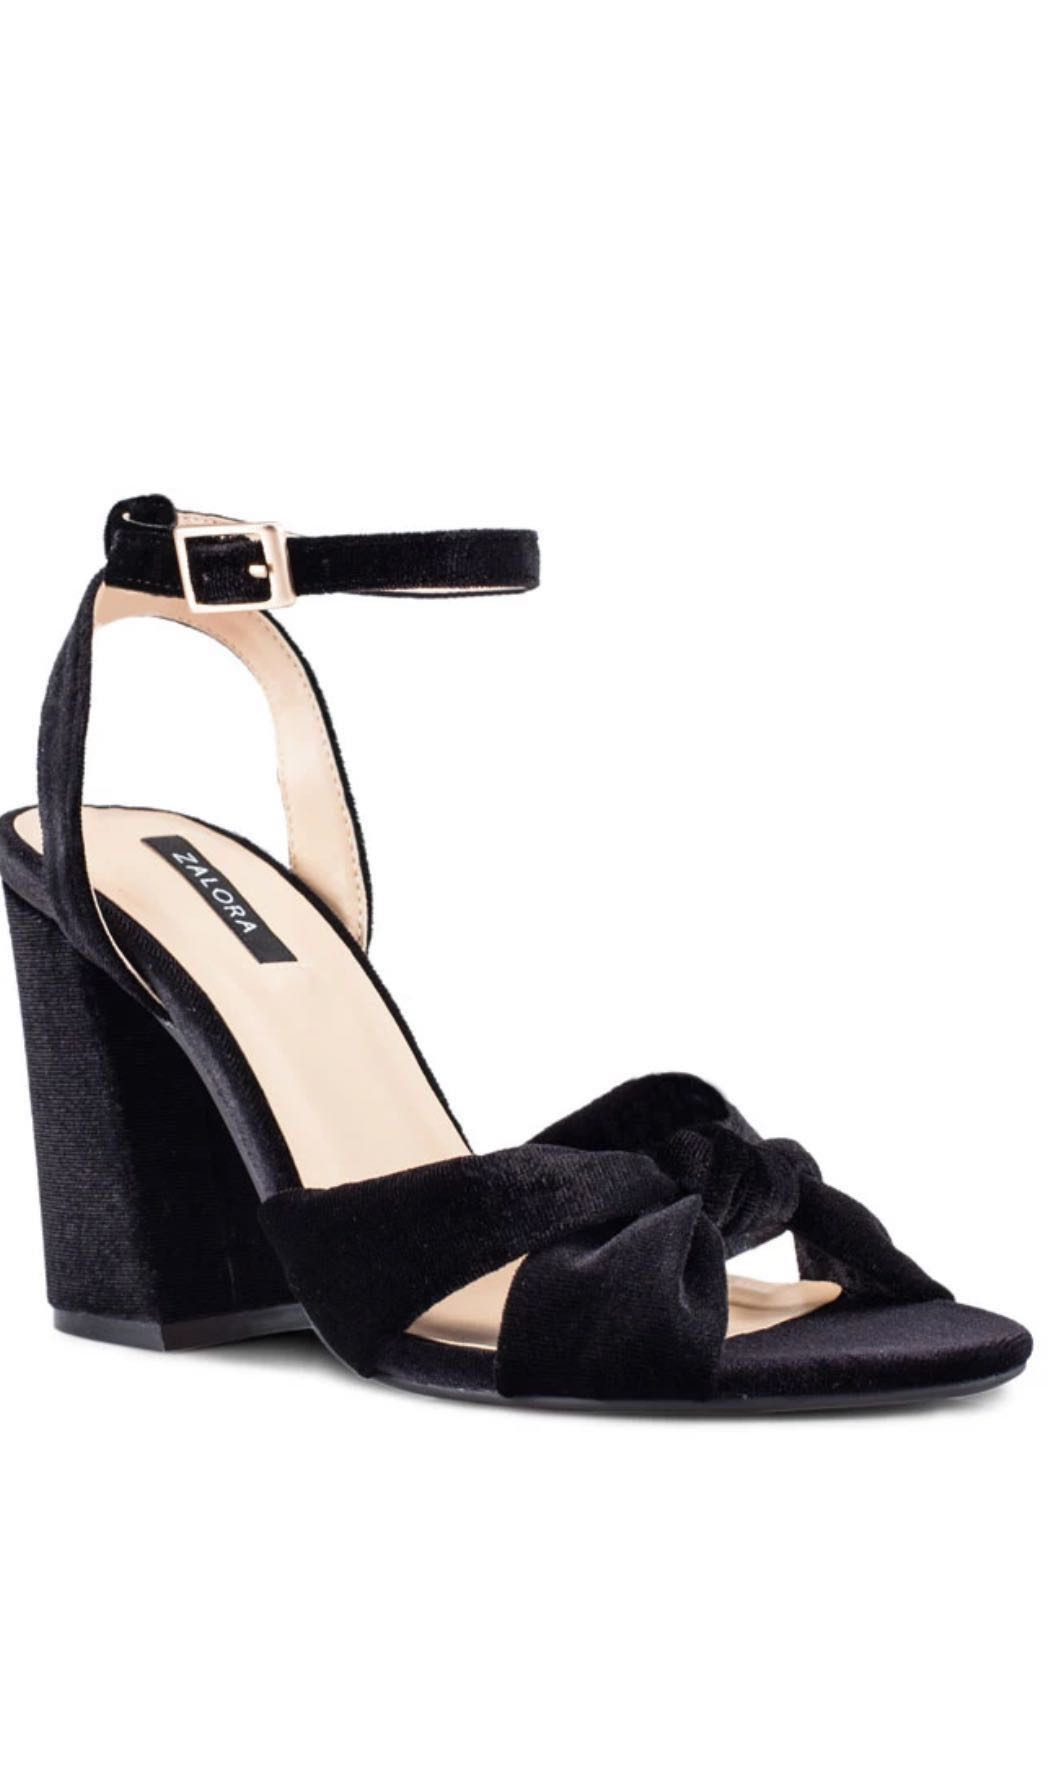 4384c86f0ac4 Home · Women s Fashion · Shoes. photo photo photo photo